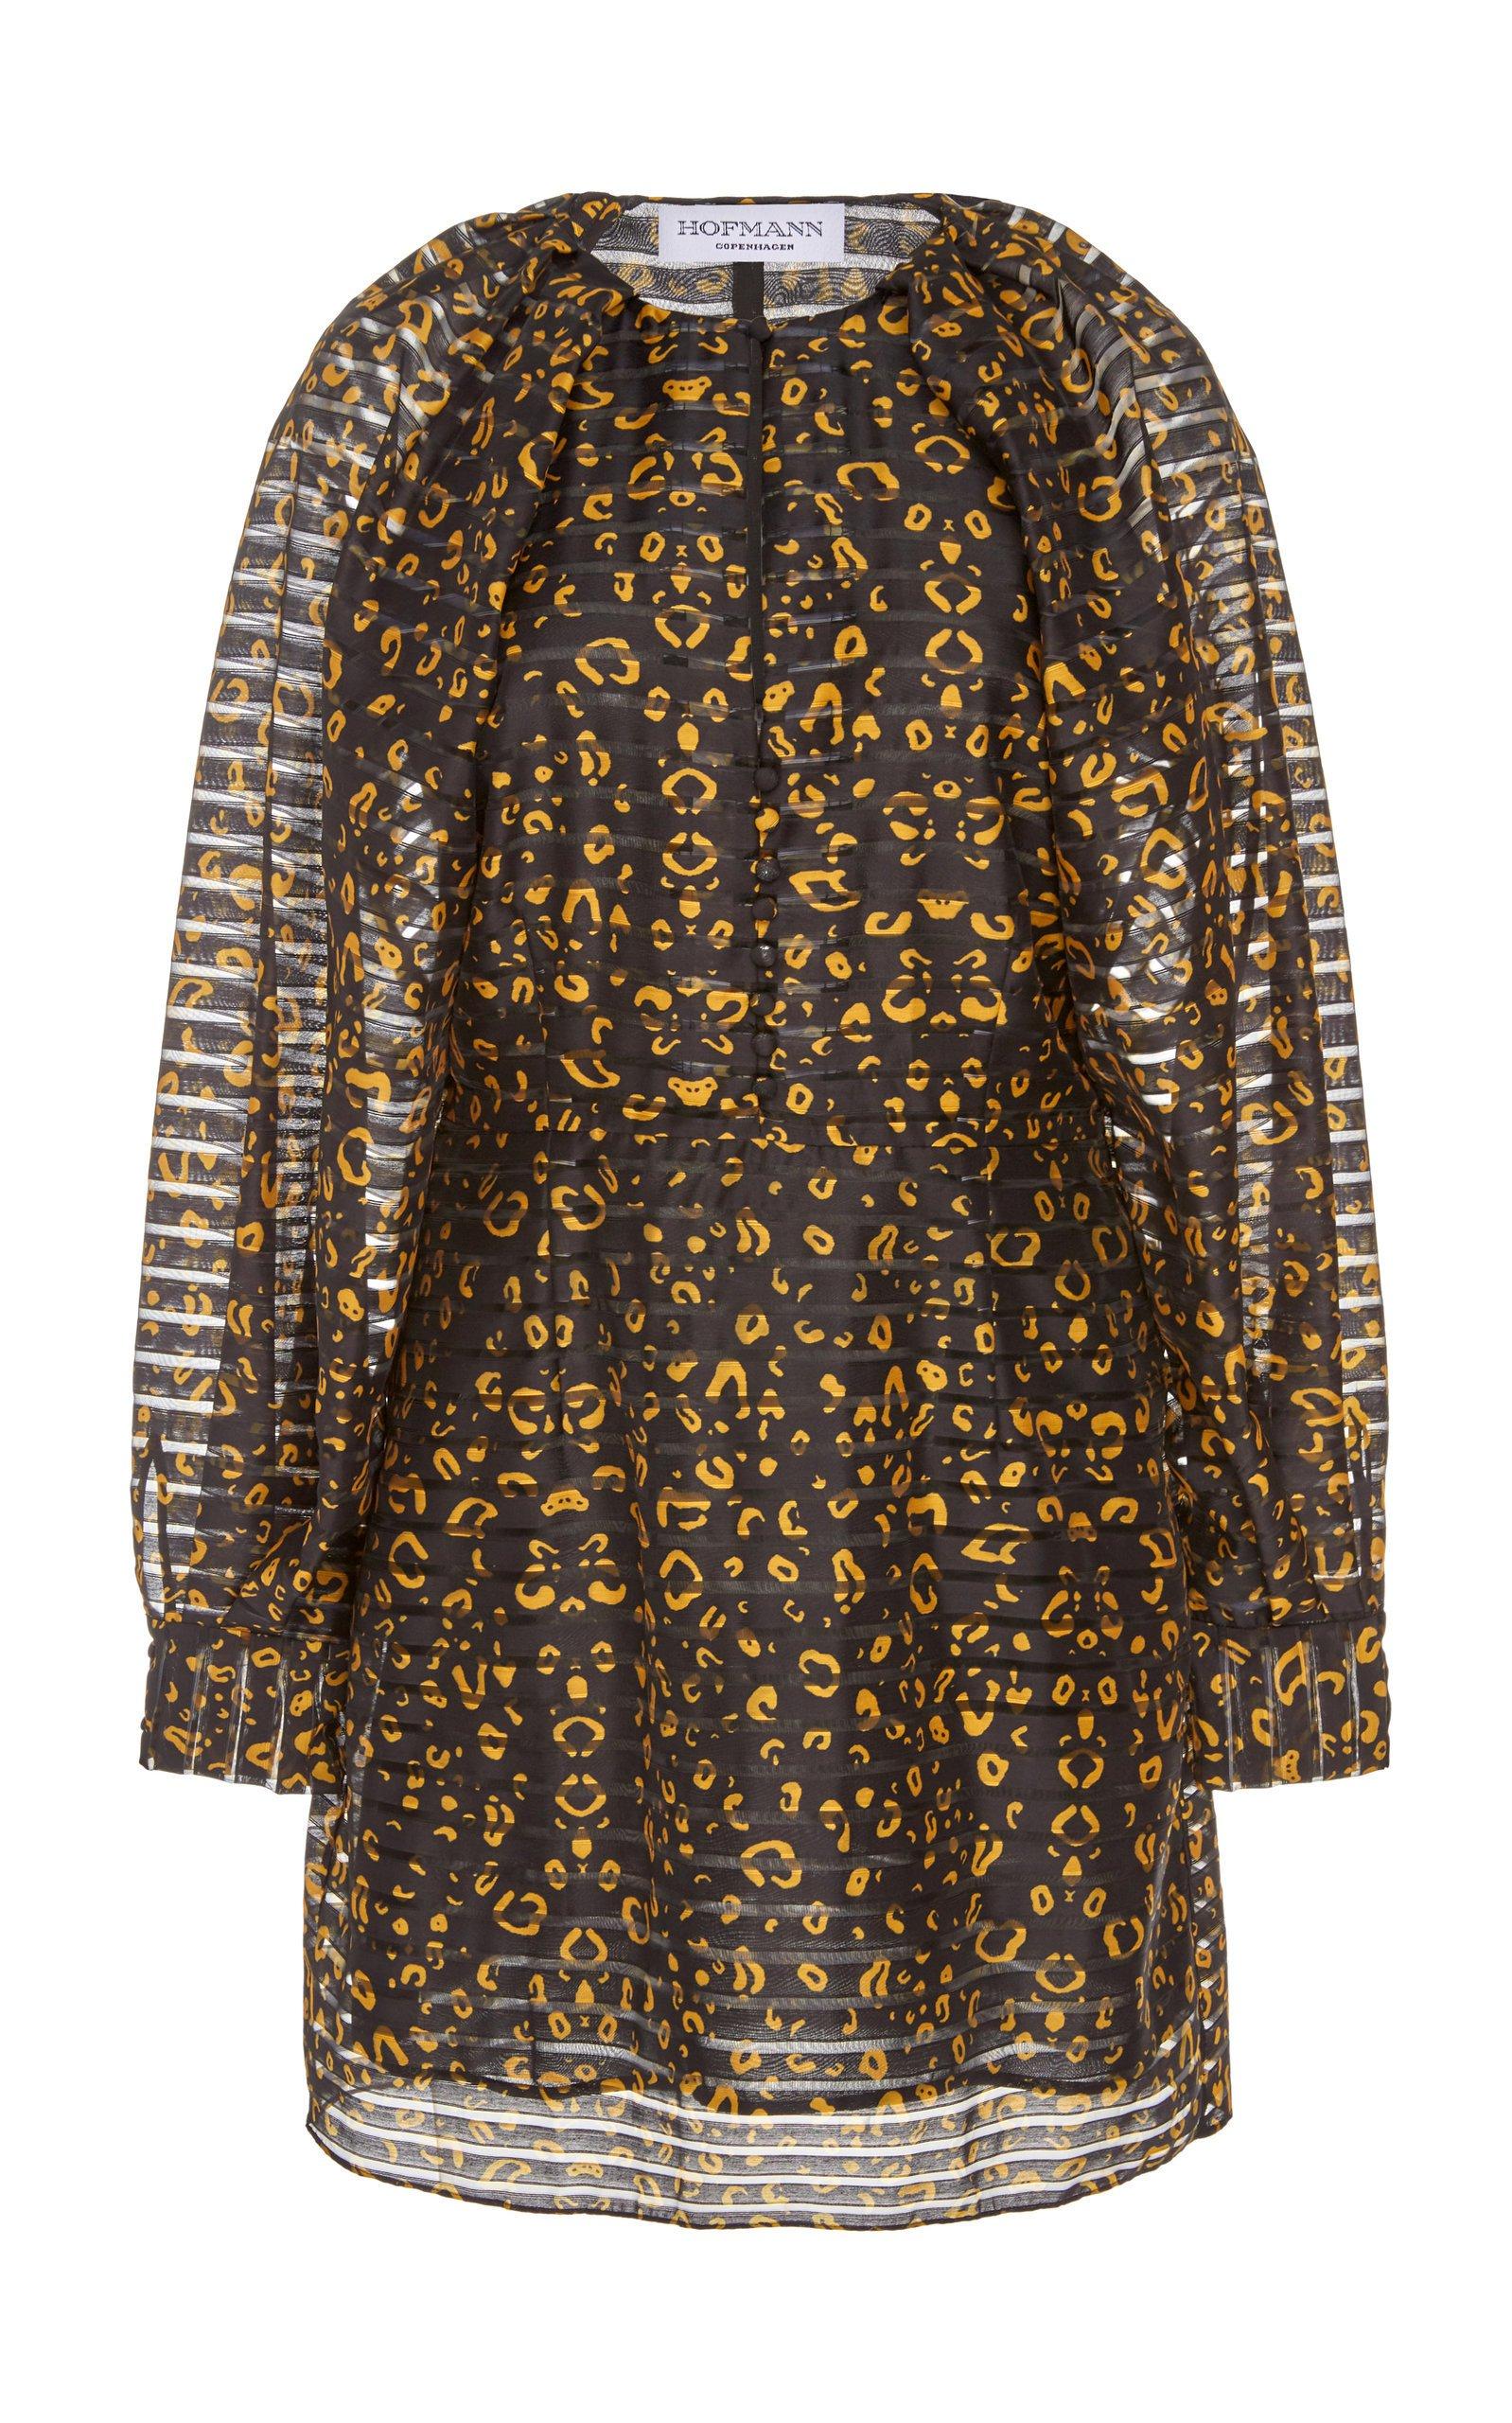 HOFMANN COPENHAGEN Alisa Puff Sleeve Printed Dress